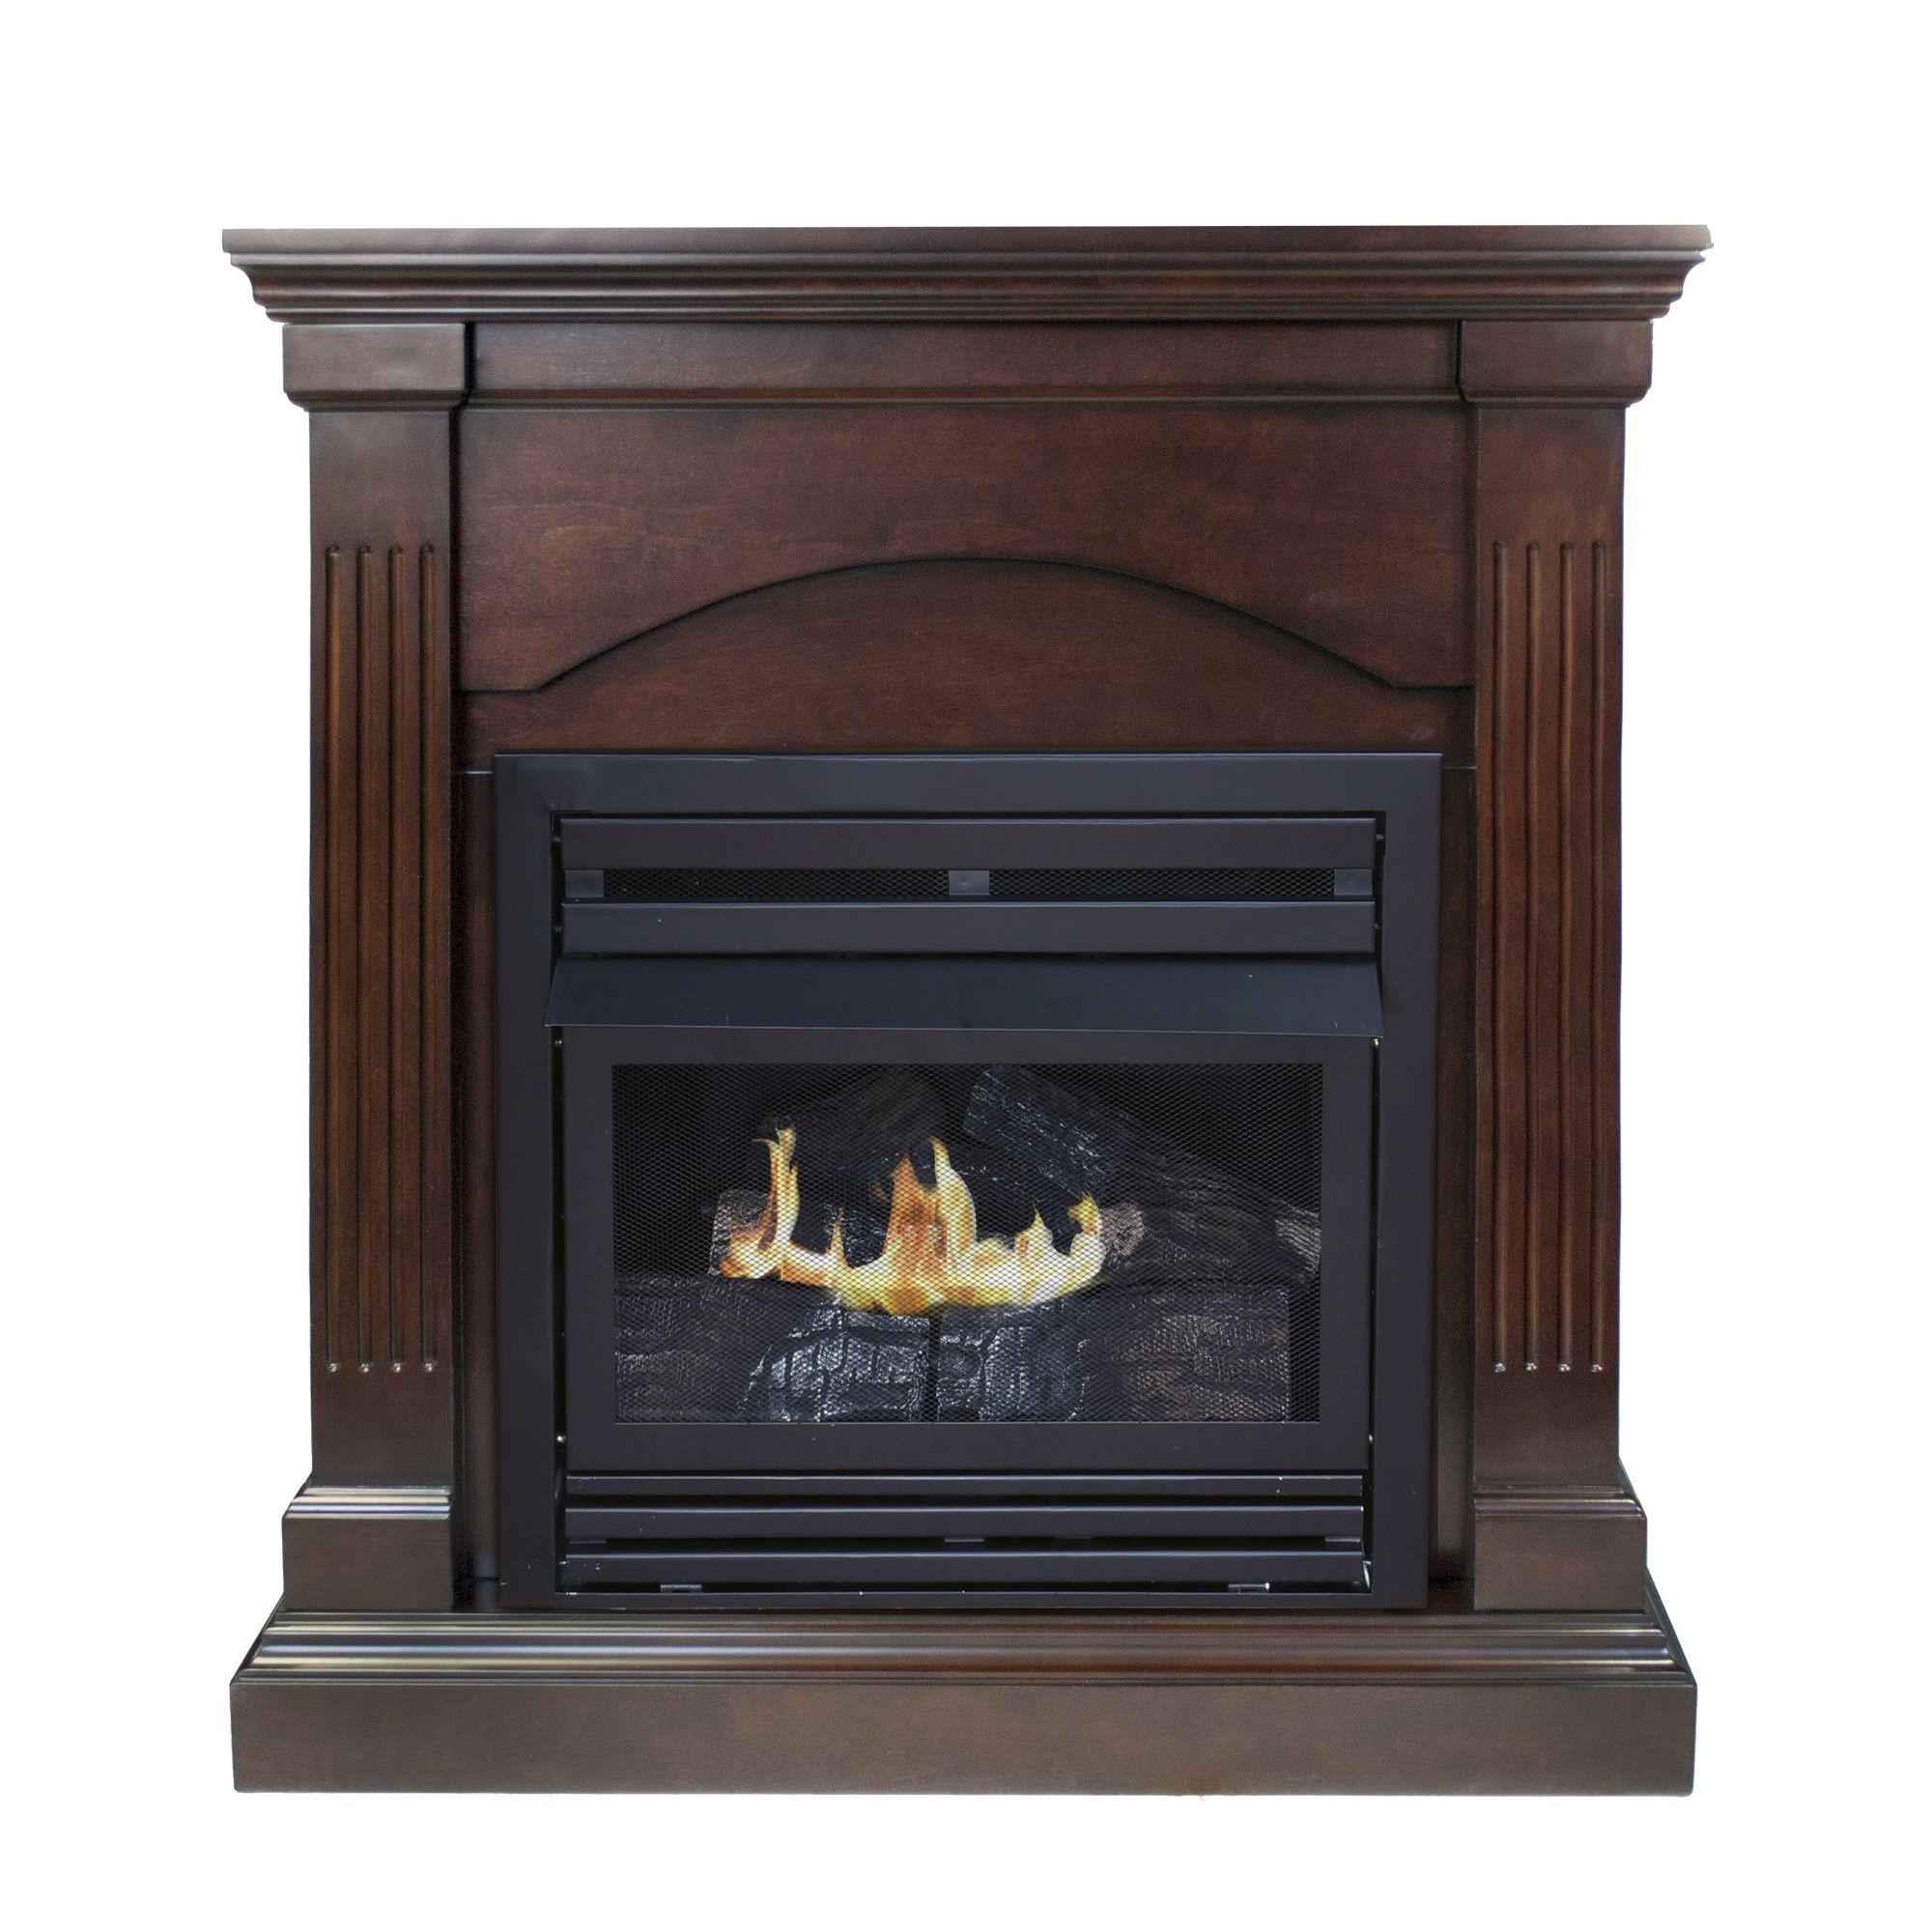 Fireplace Screens Menards Awesome Pinterest